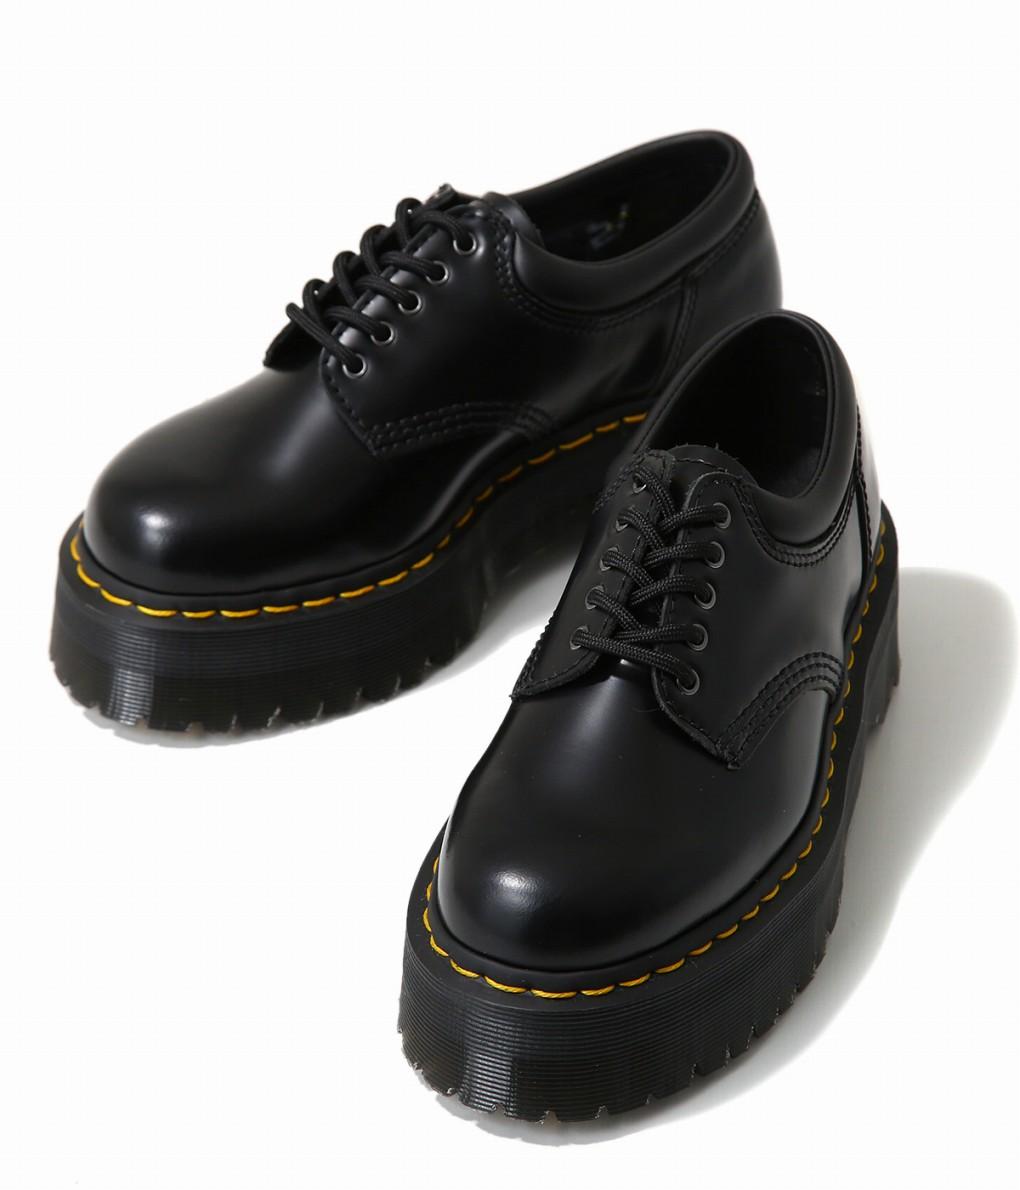 Dr.Martens / ドクターマーチン : 8053 QUAD : クアド シューズ ドクターマーチン 靴 ブーツ : 24690001 【ANN】